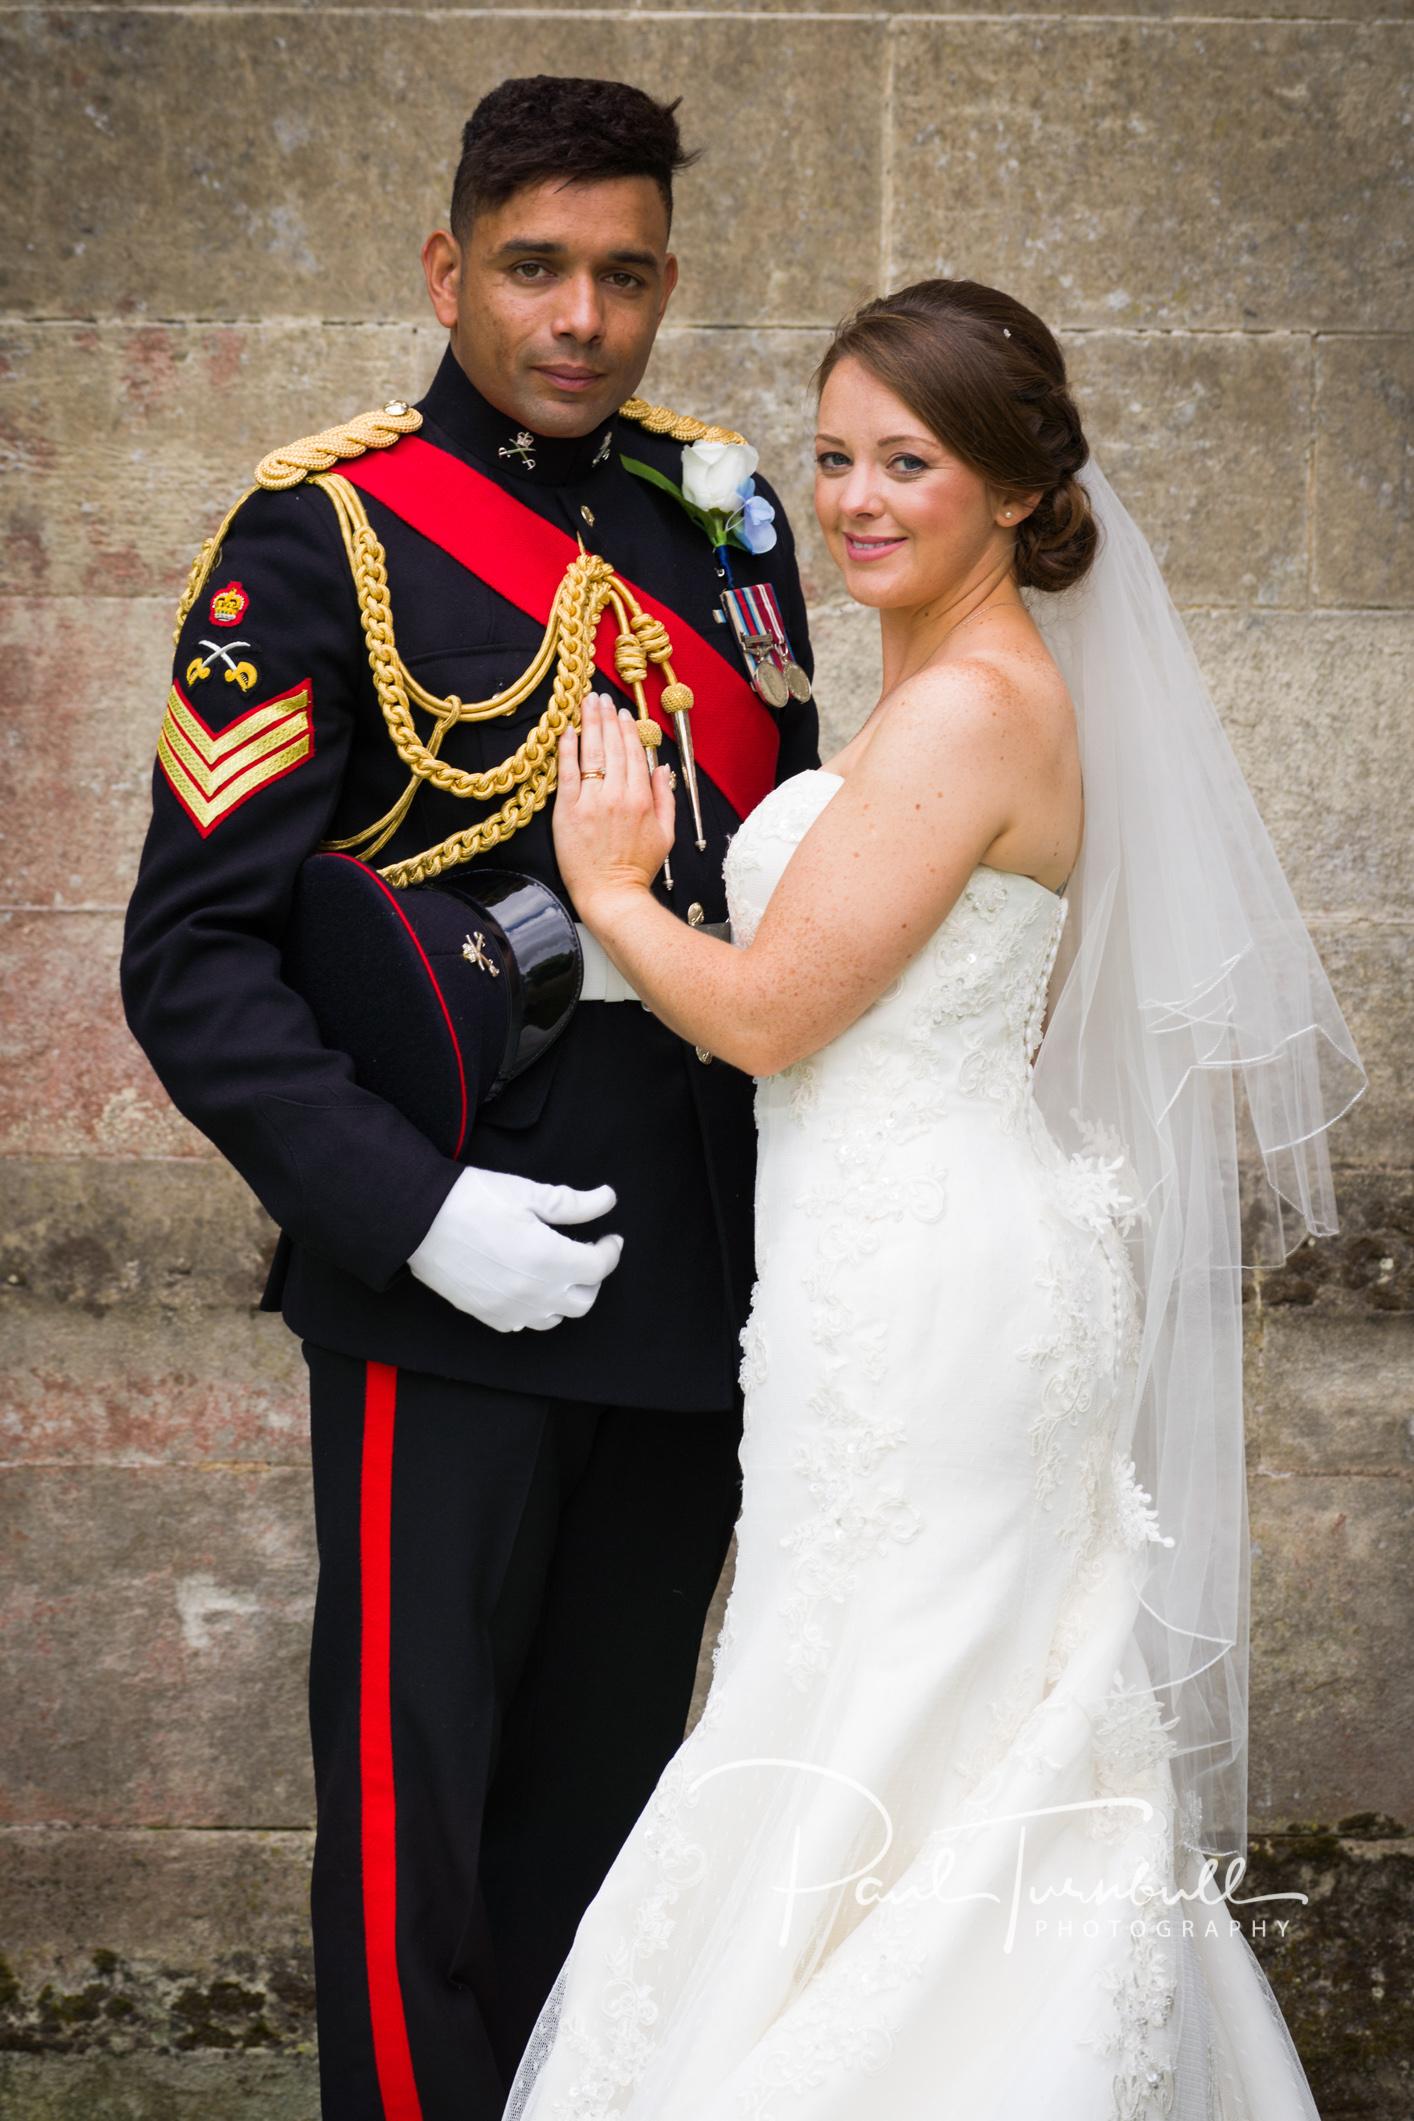 wedding-photographer-south-dalton-walkington-yorkshire-emma-james-045.jpg